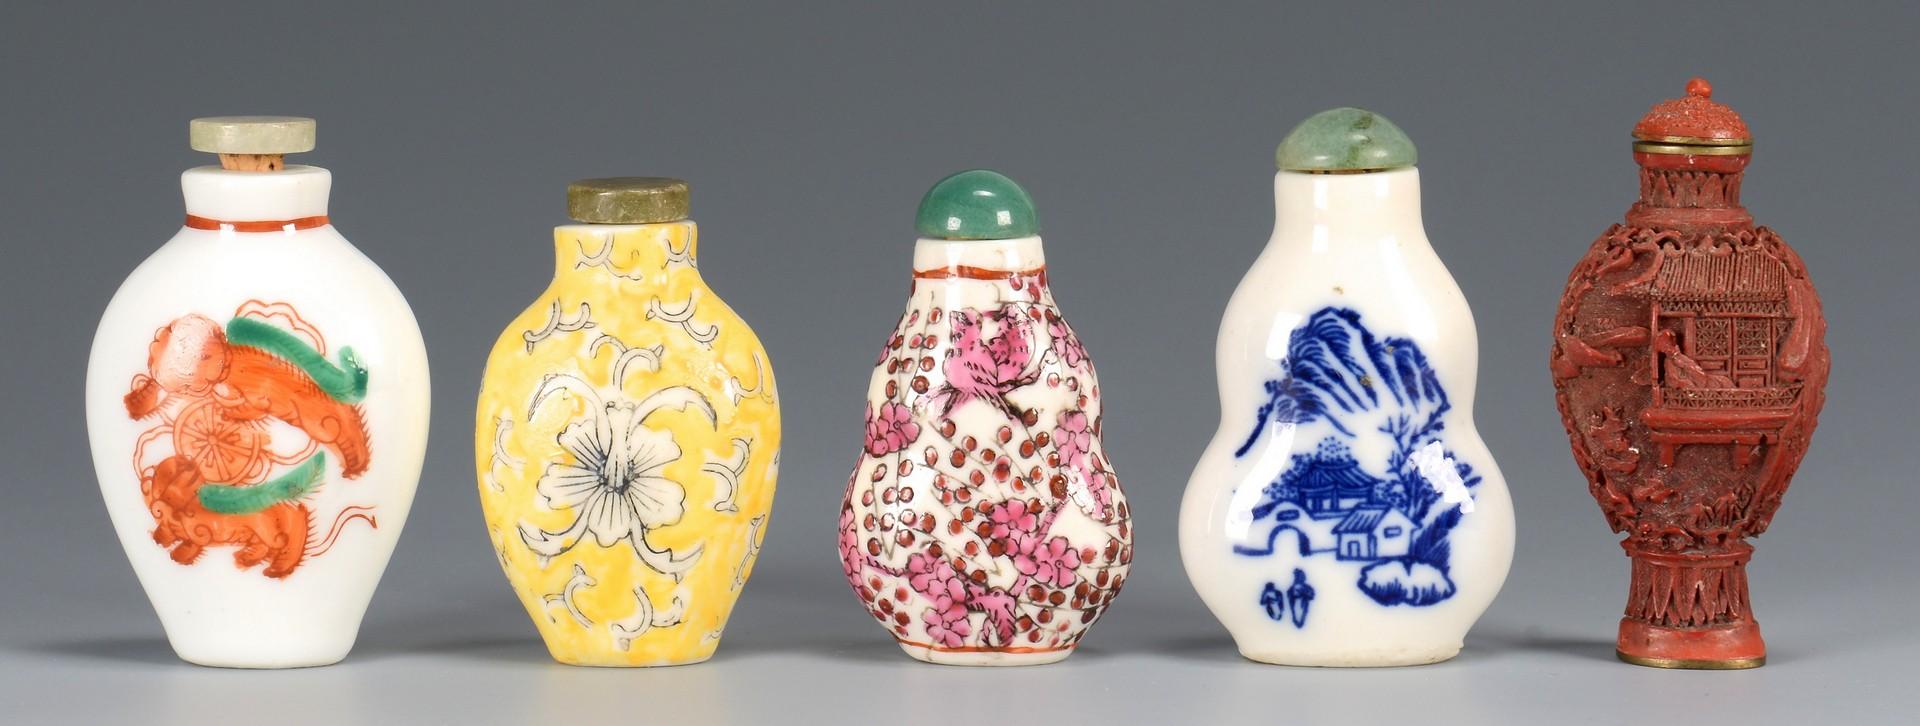 Lot 3594191: 5 Snuff bottles & 1 Opium Burner